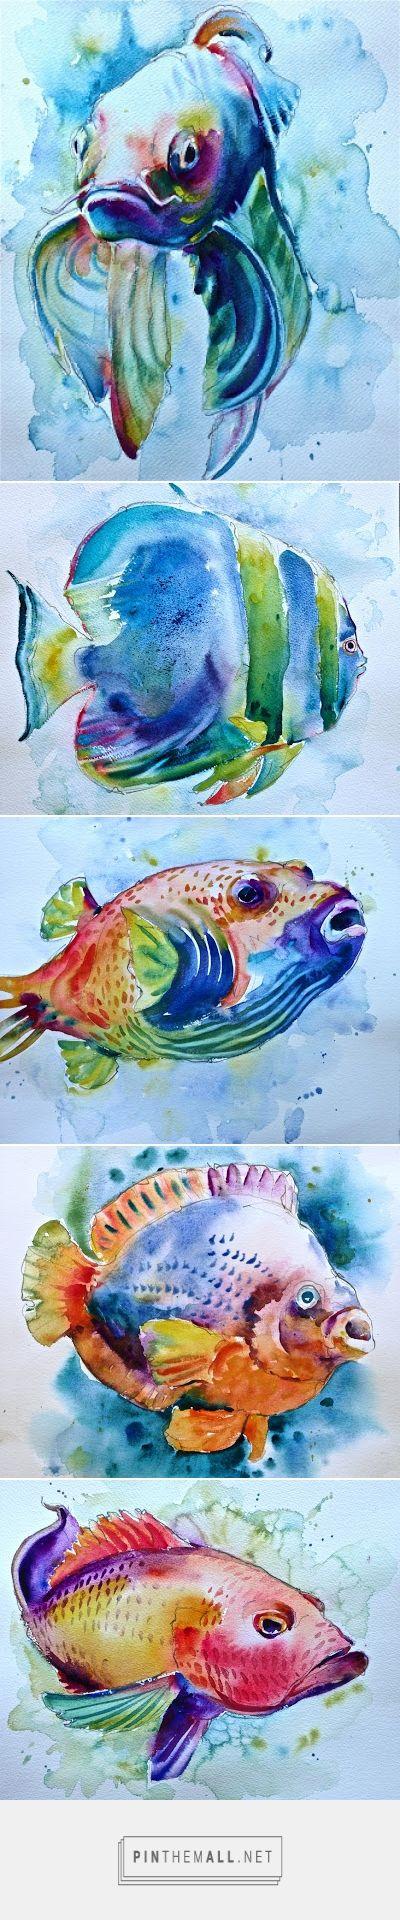 Watercolors by David Lobenberg: More fish in my net